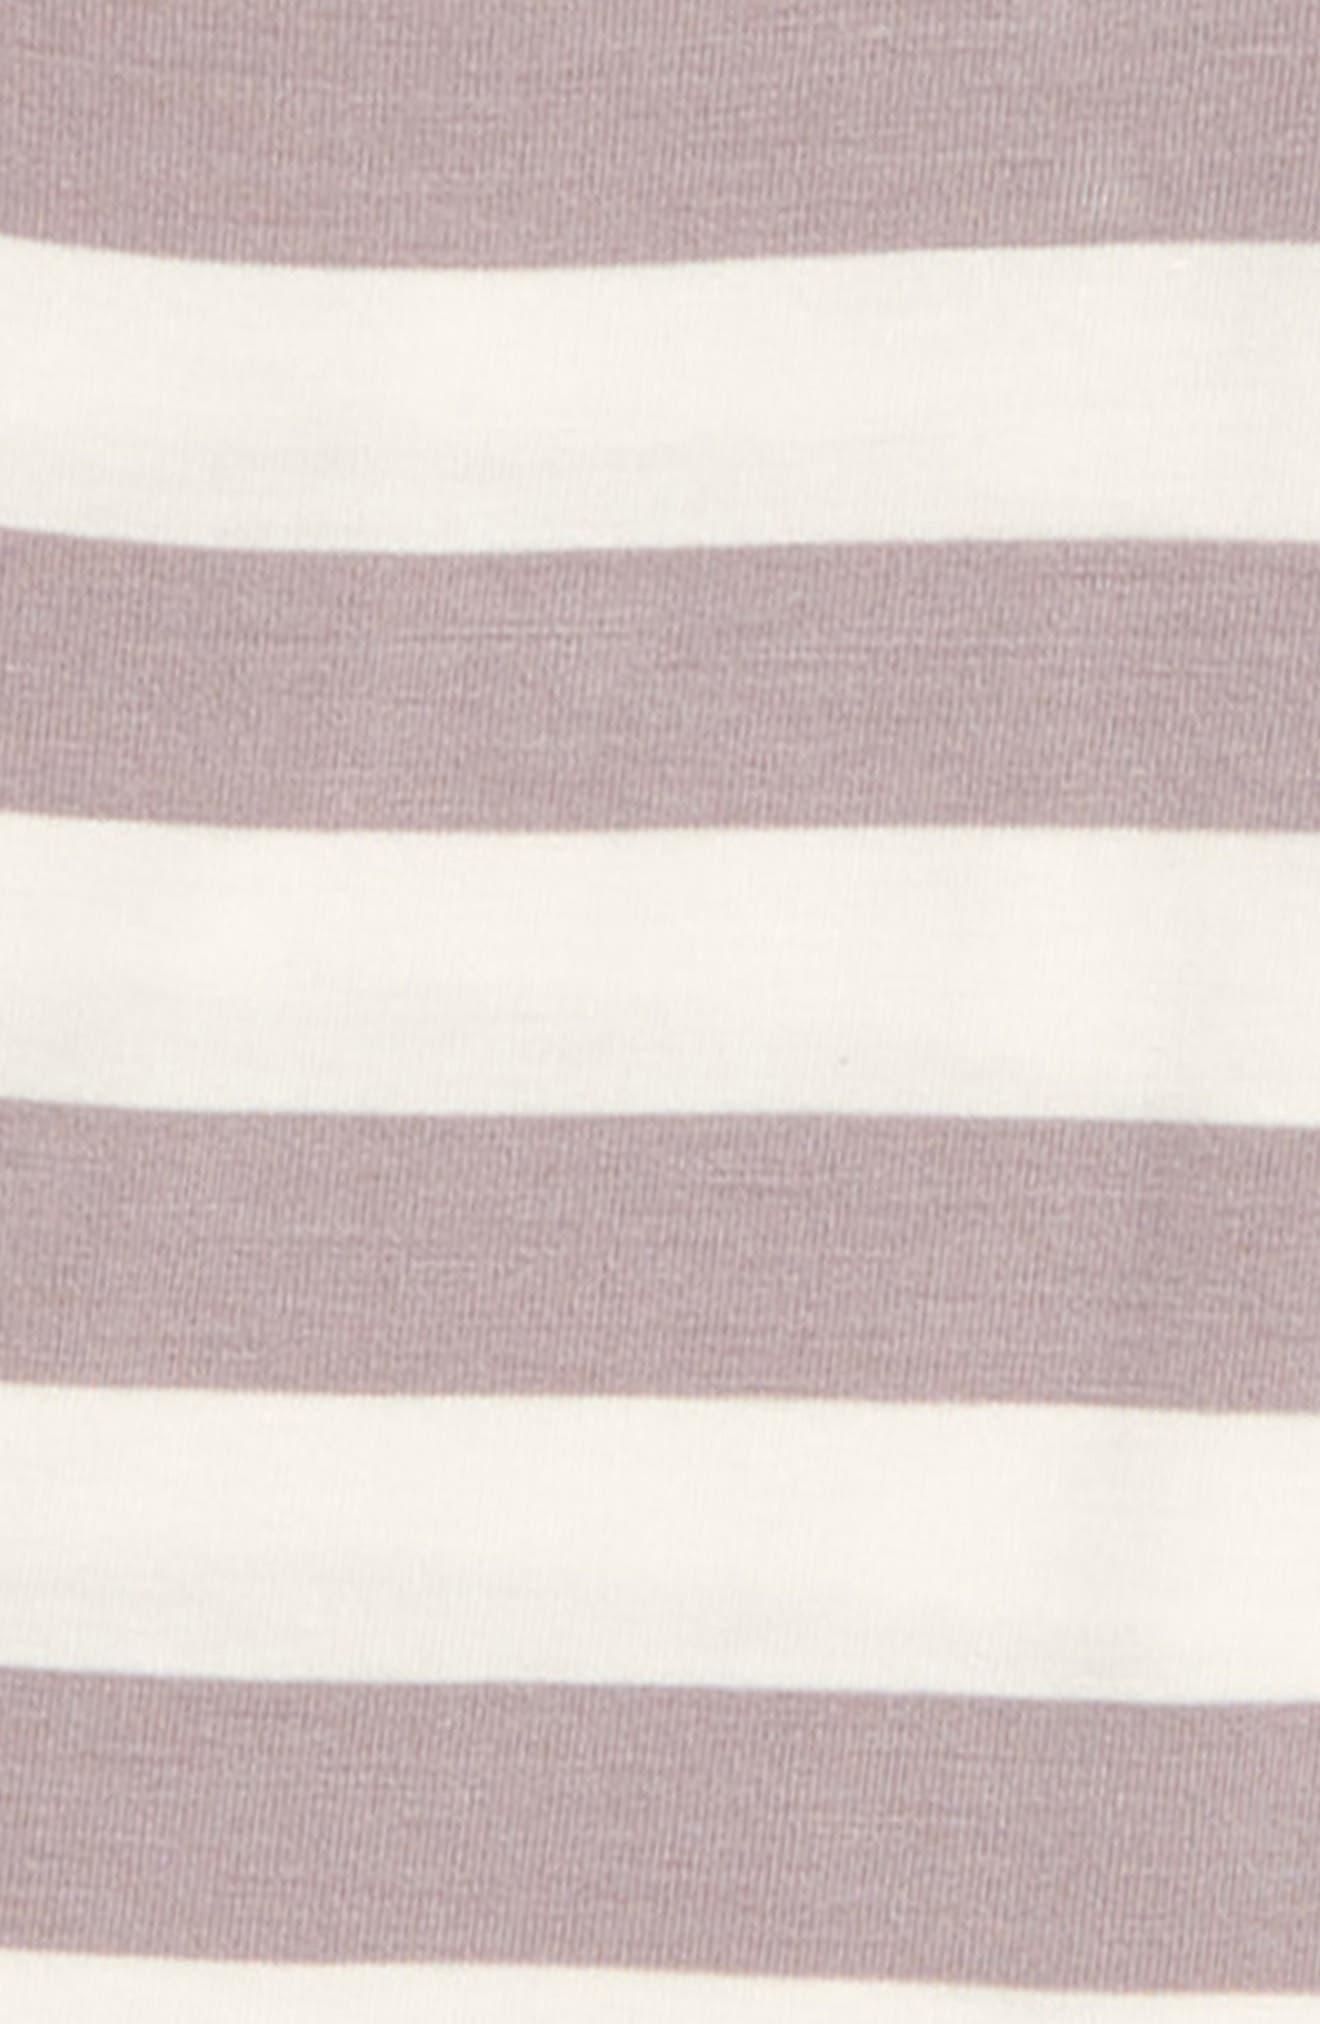 Feather Contrast Stripe Three-Piece Hat, Bodysuit & Pants Set,                             Alternate thumbnail 2, color,                             Feather/ Stripe